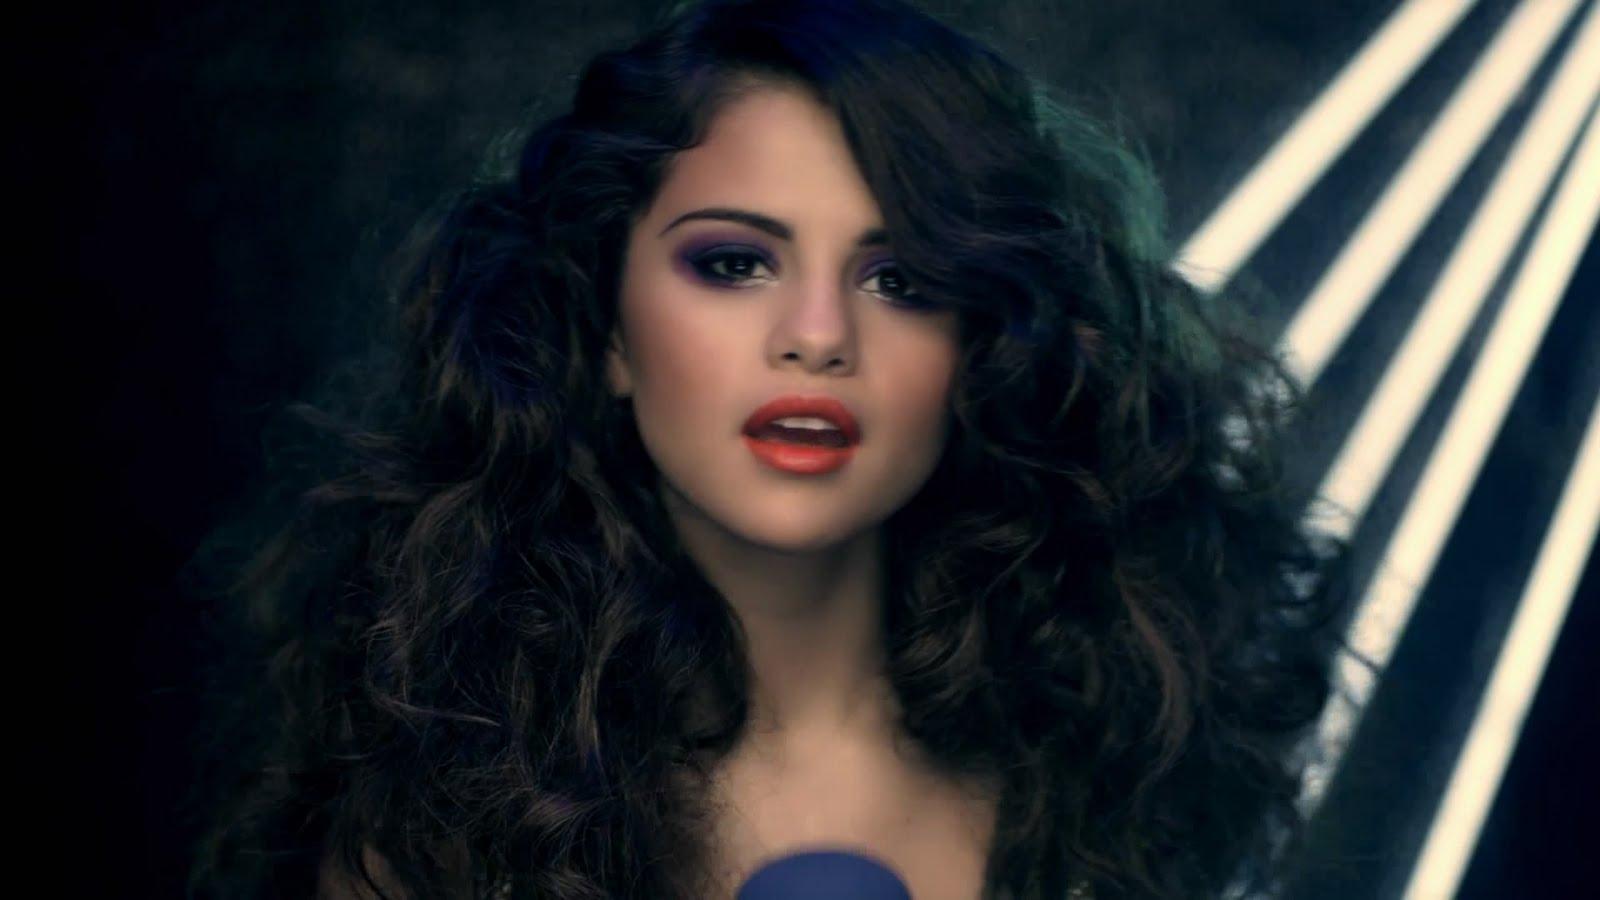 http://3.bp.blogspot.com/--Pe29tvhtDc/Tg_9UdLL08I/AAAAAAAAAJ8/kBSxmNBFTyg/s1600/Selena+Gomez+%2526+The+Scene+-+Love+You+Like+A+Love+Song.mp4_snapshot_00.22_%255B2011.06.28_18.24.45%255D.jpg